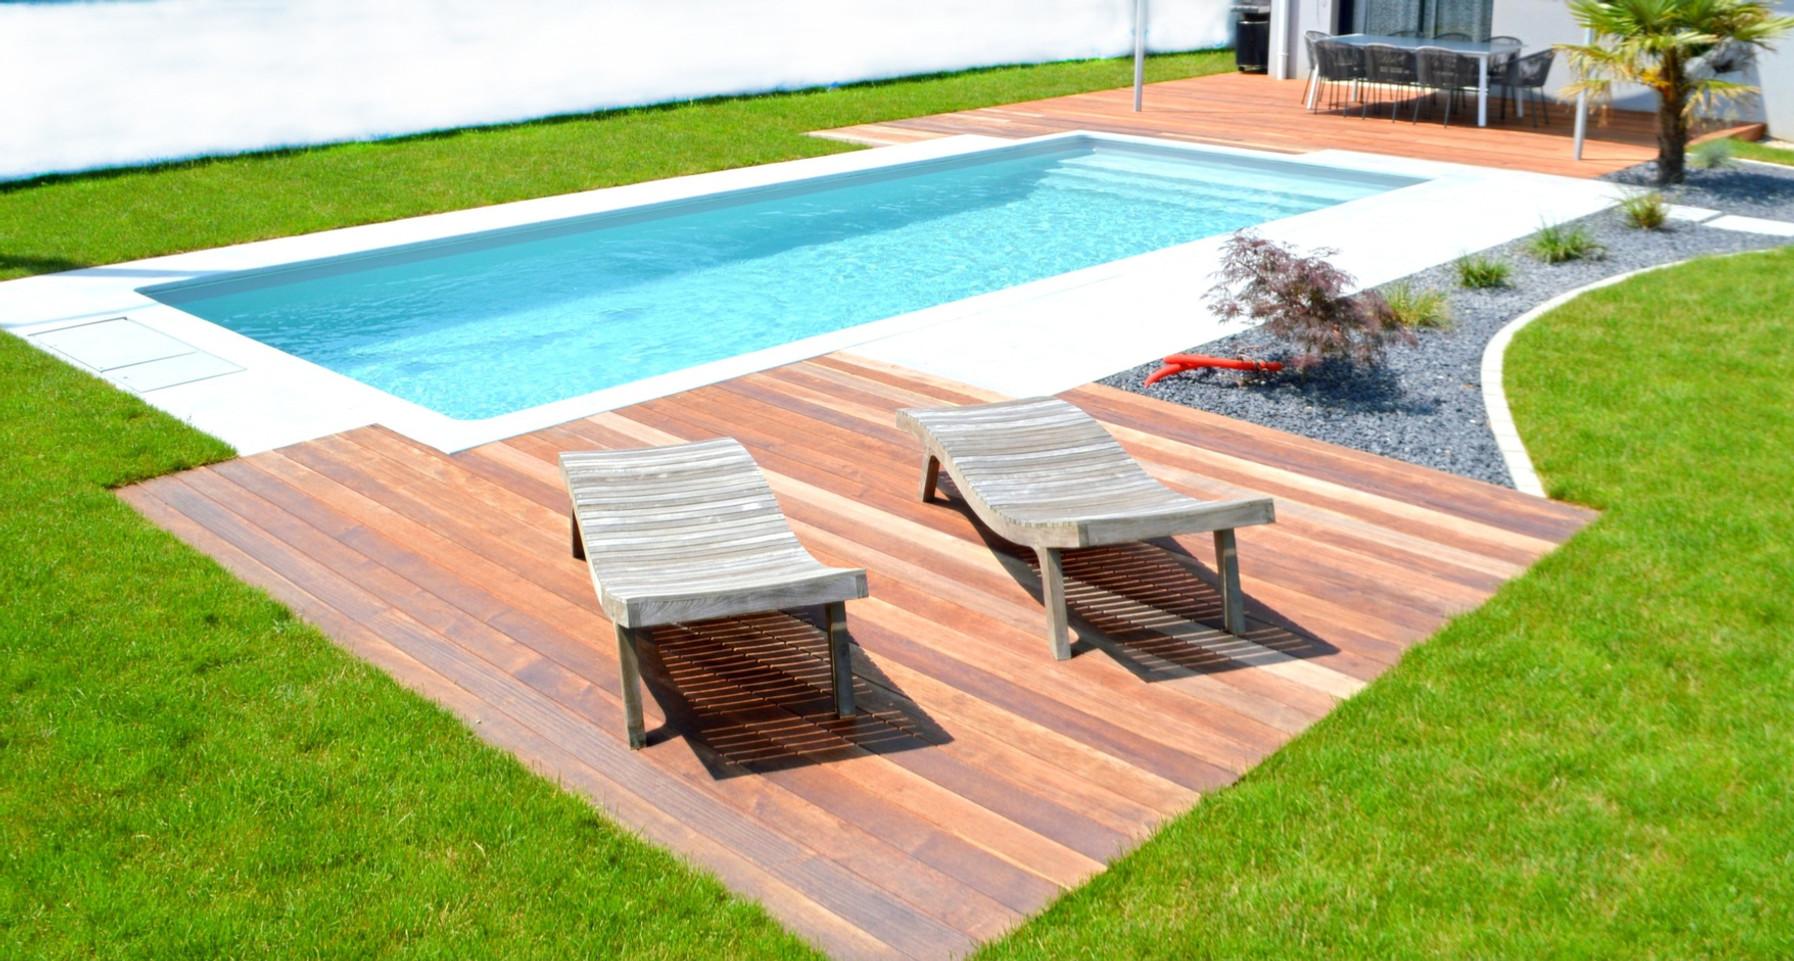 terrasse-bois-piscine-qualite-paysage_ed